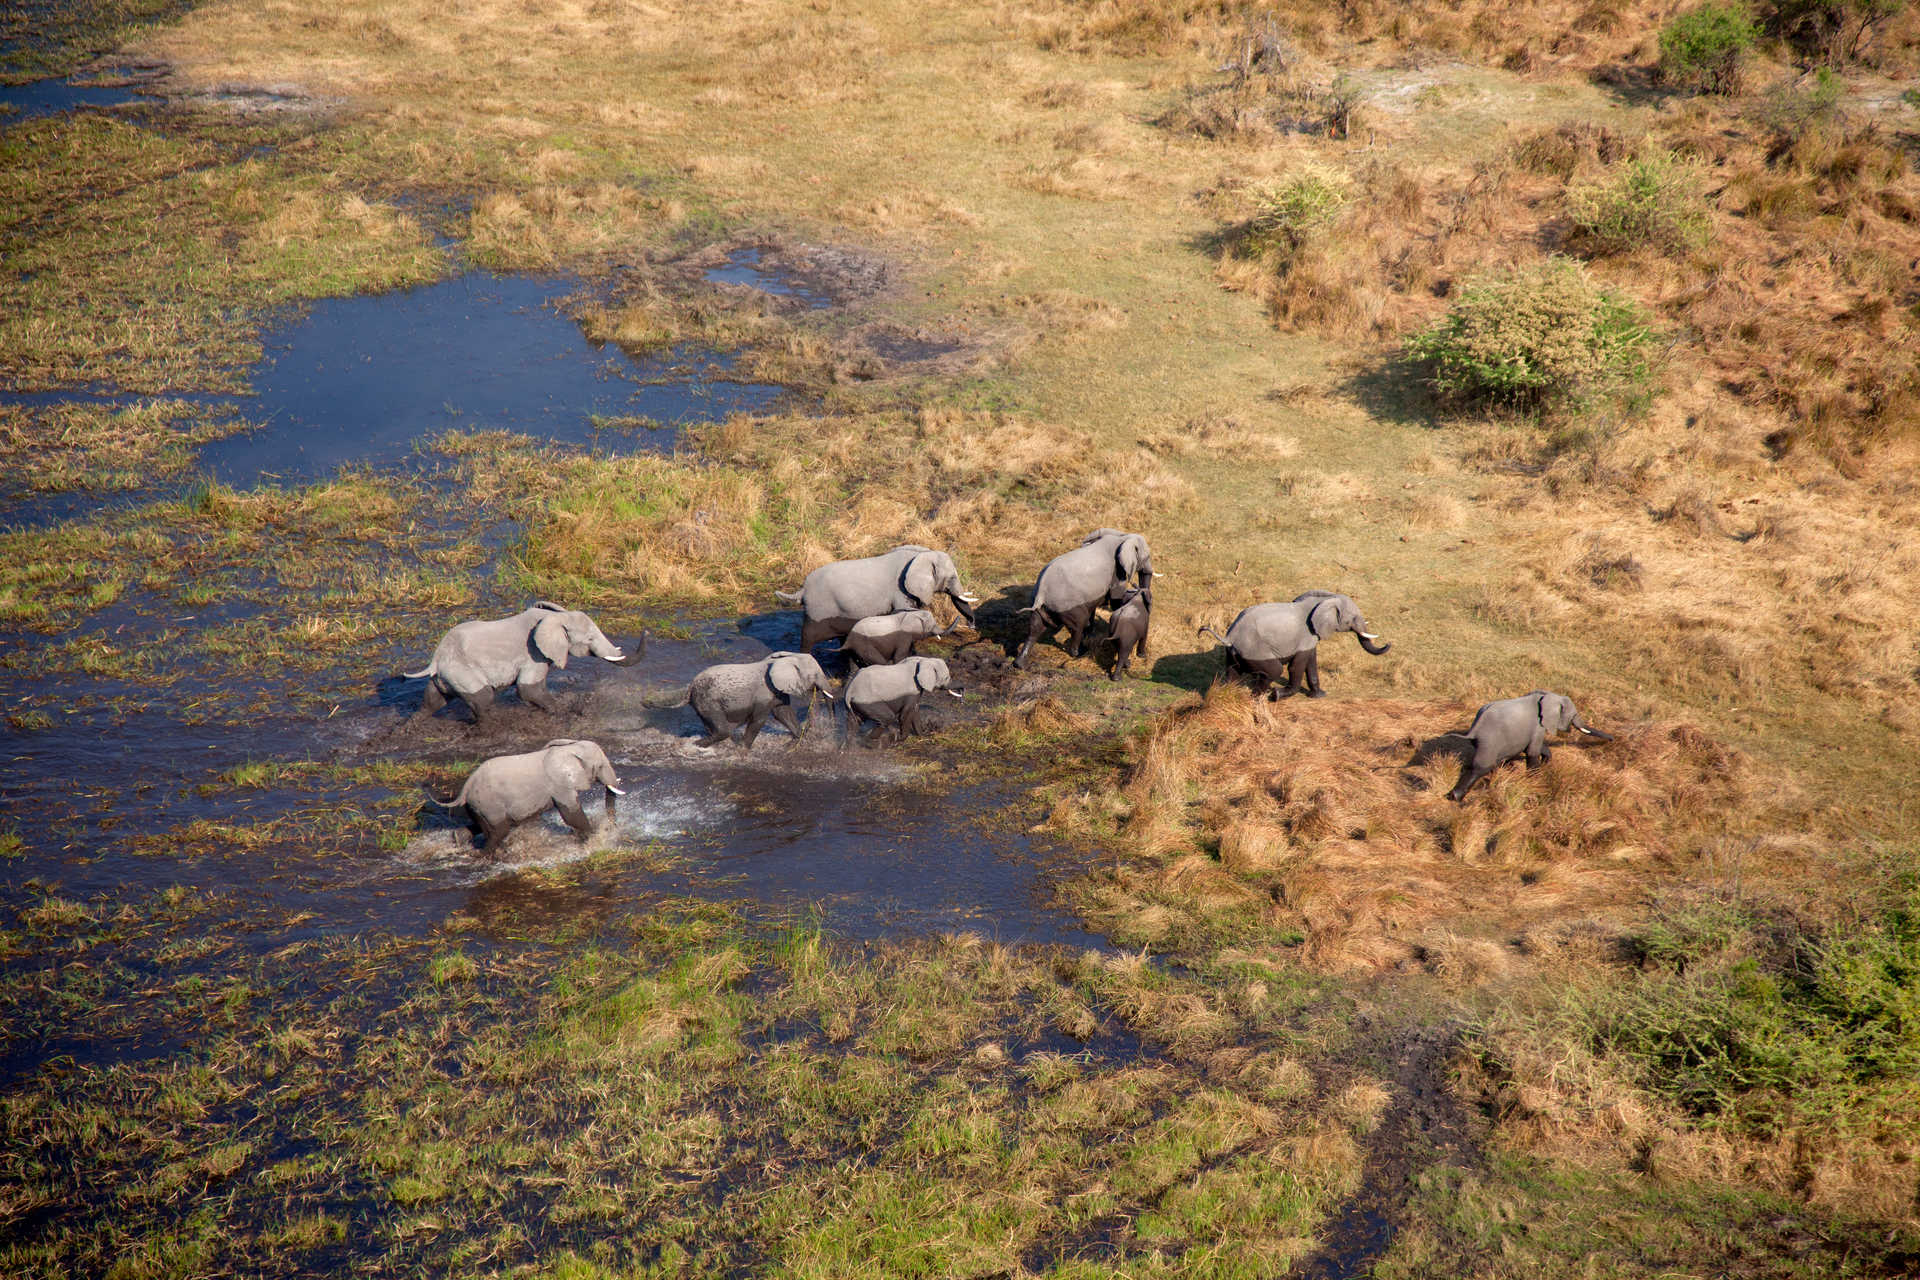 Éléphants au delta de l'Okavango vus du ciel